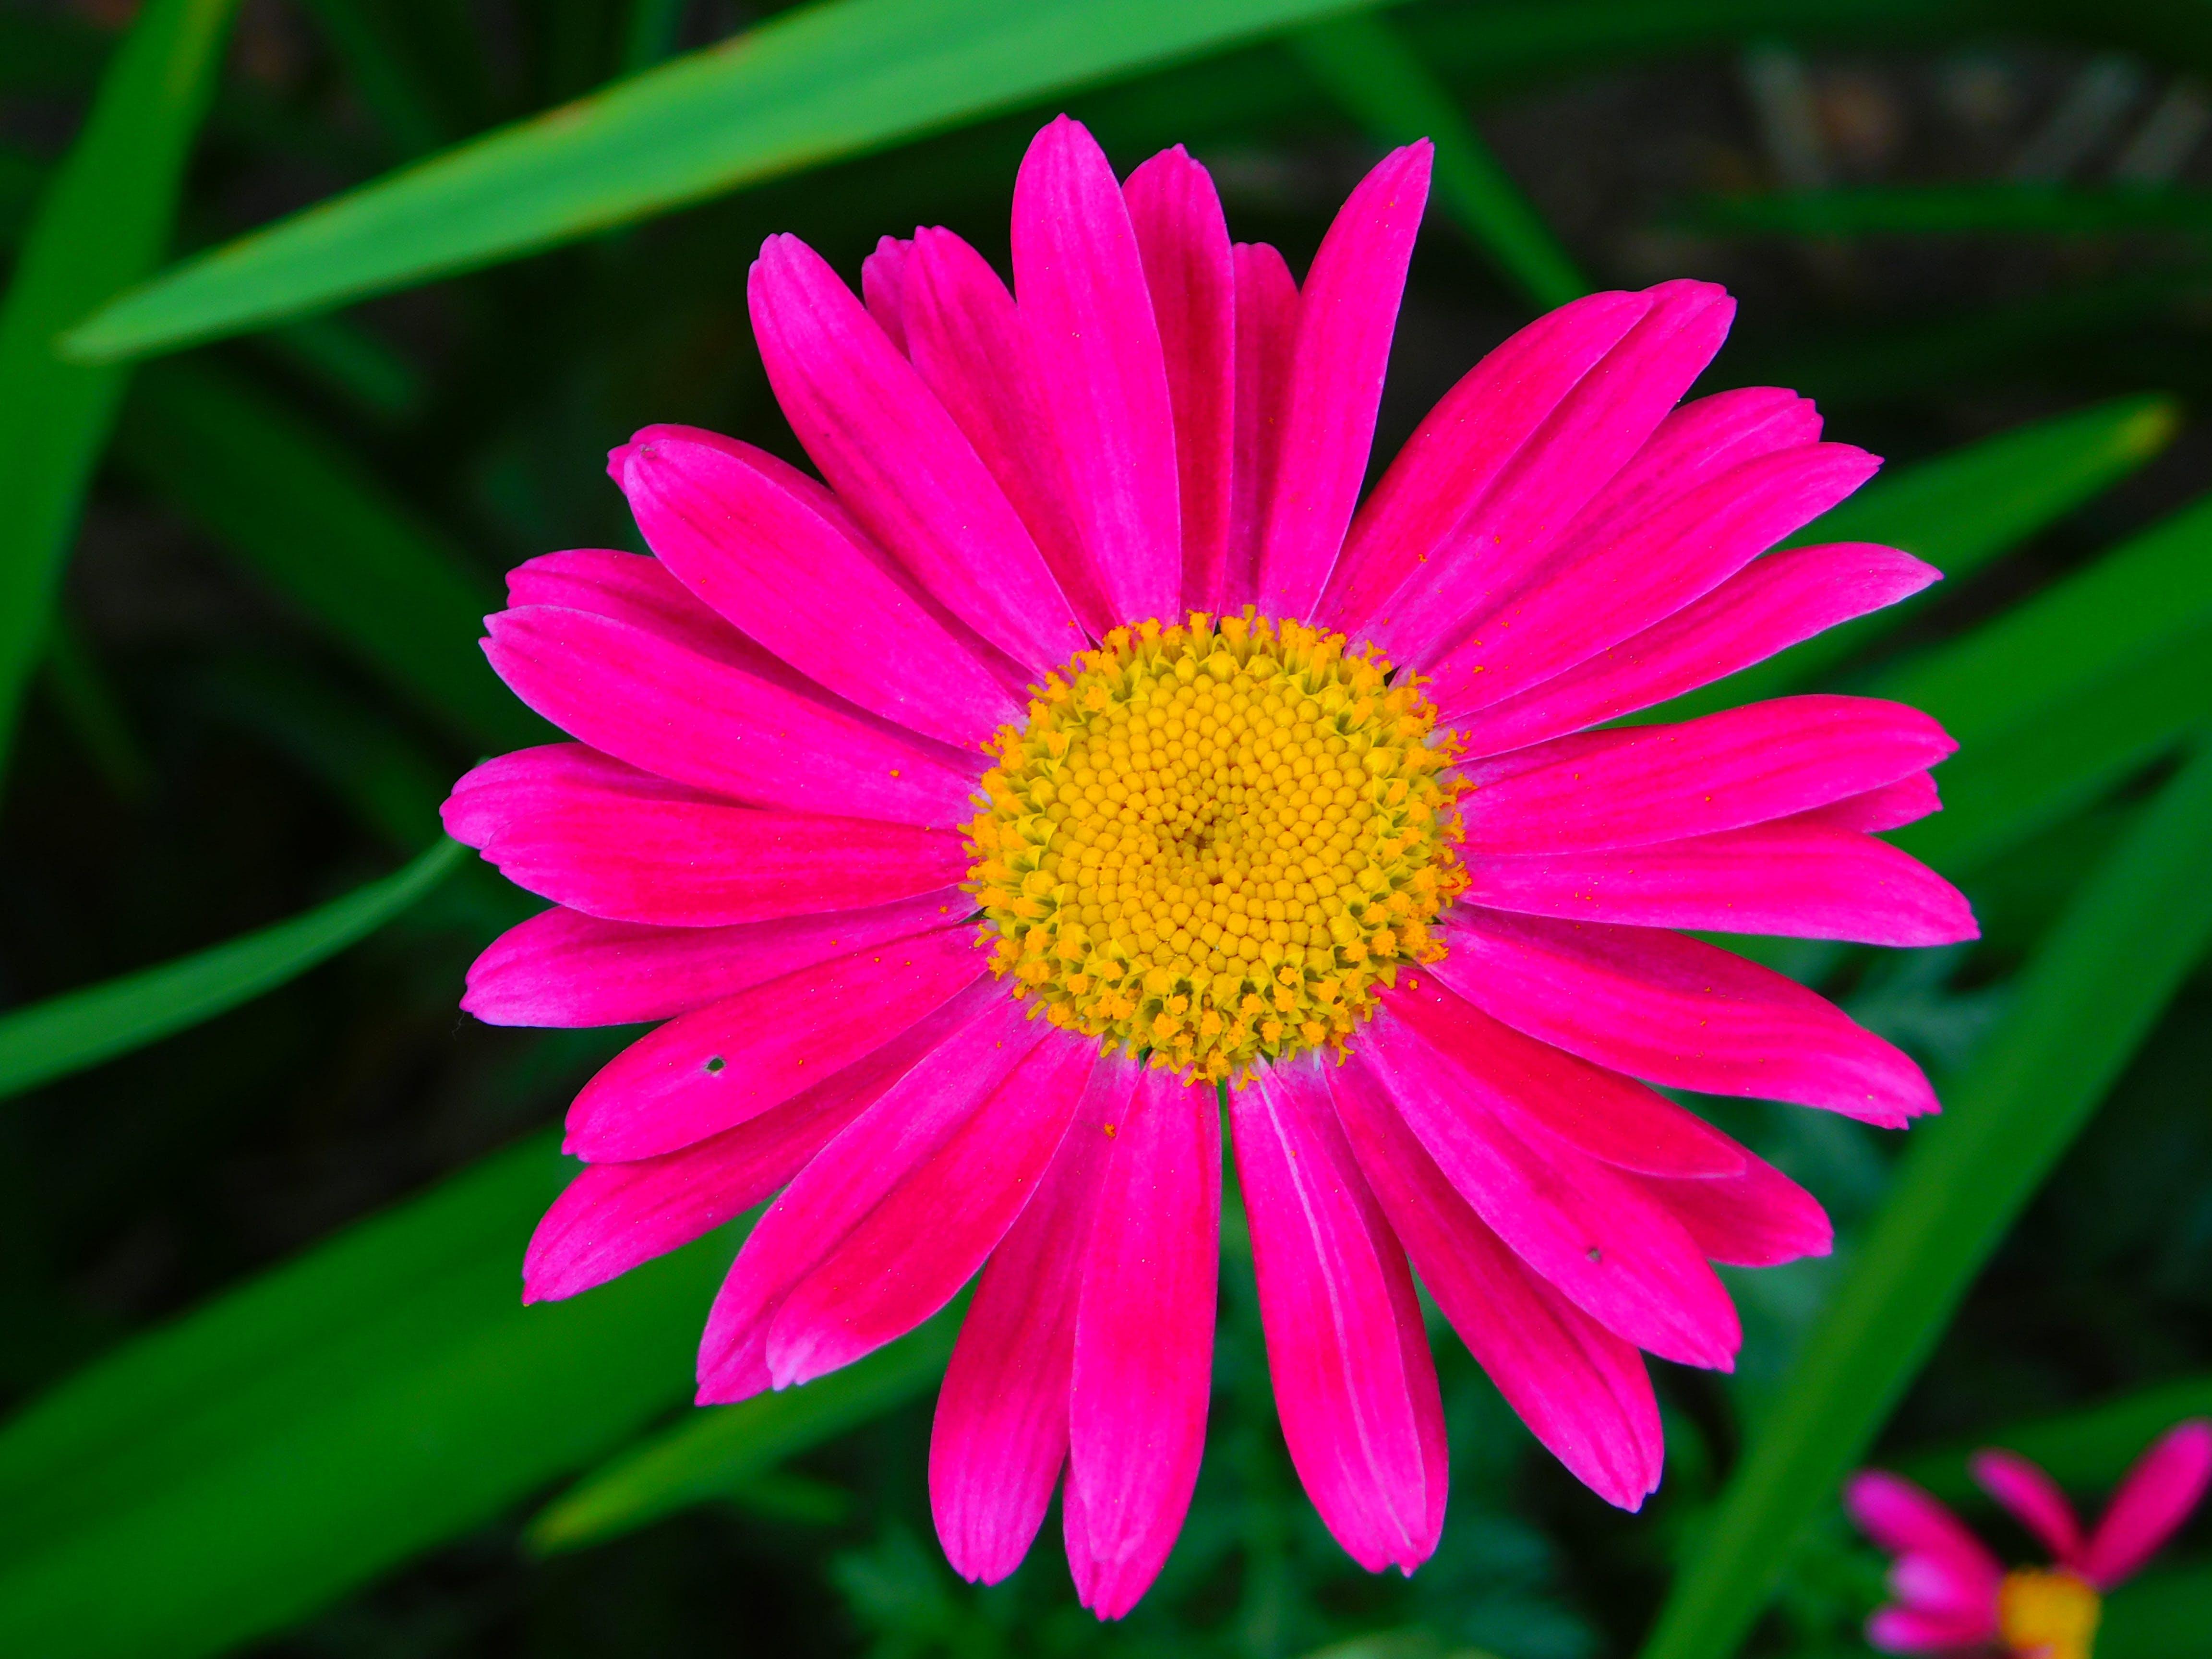 beauty of the bloom, macro, pink daisy